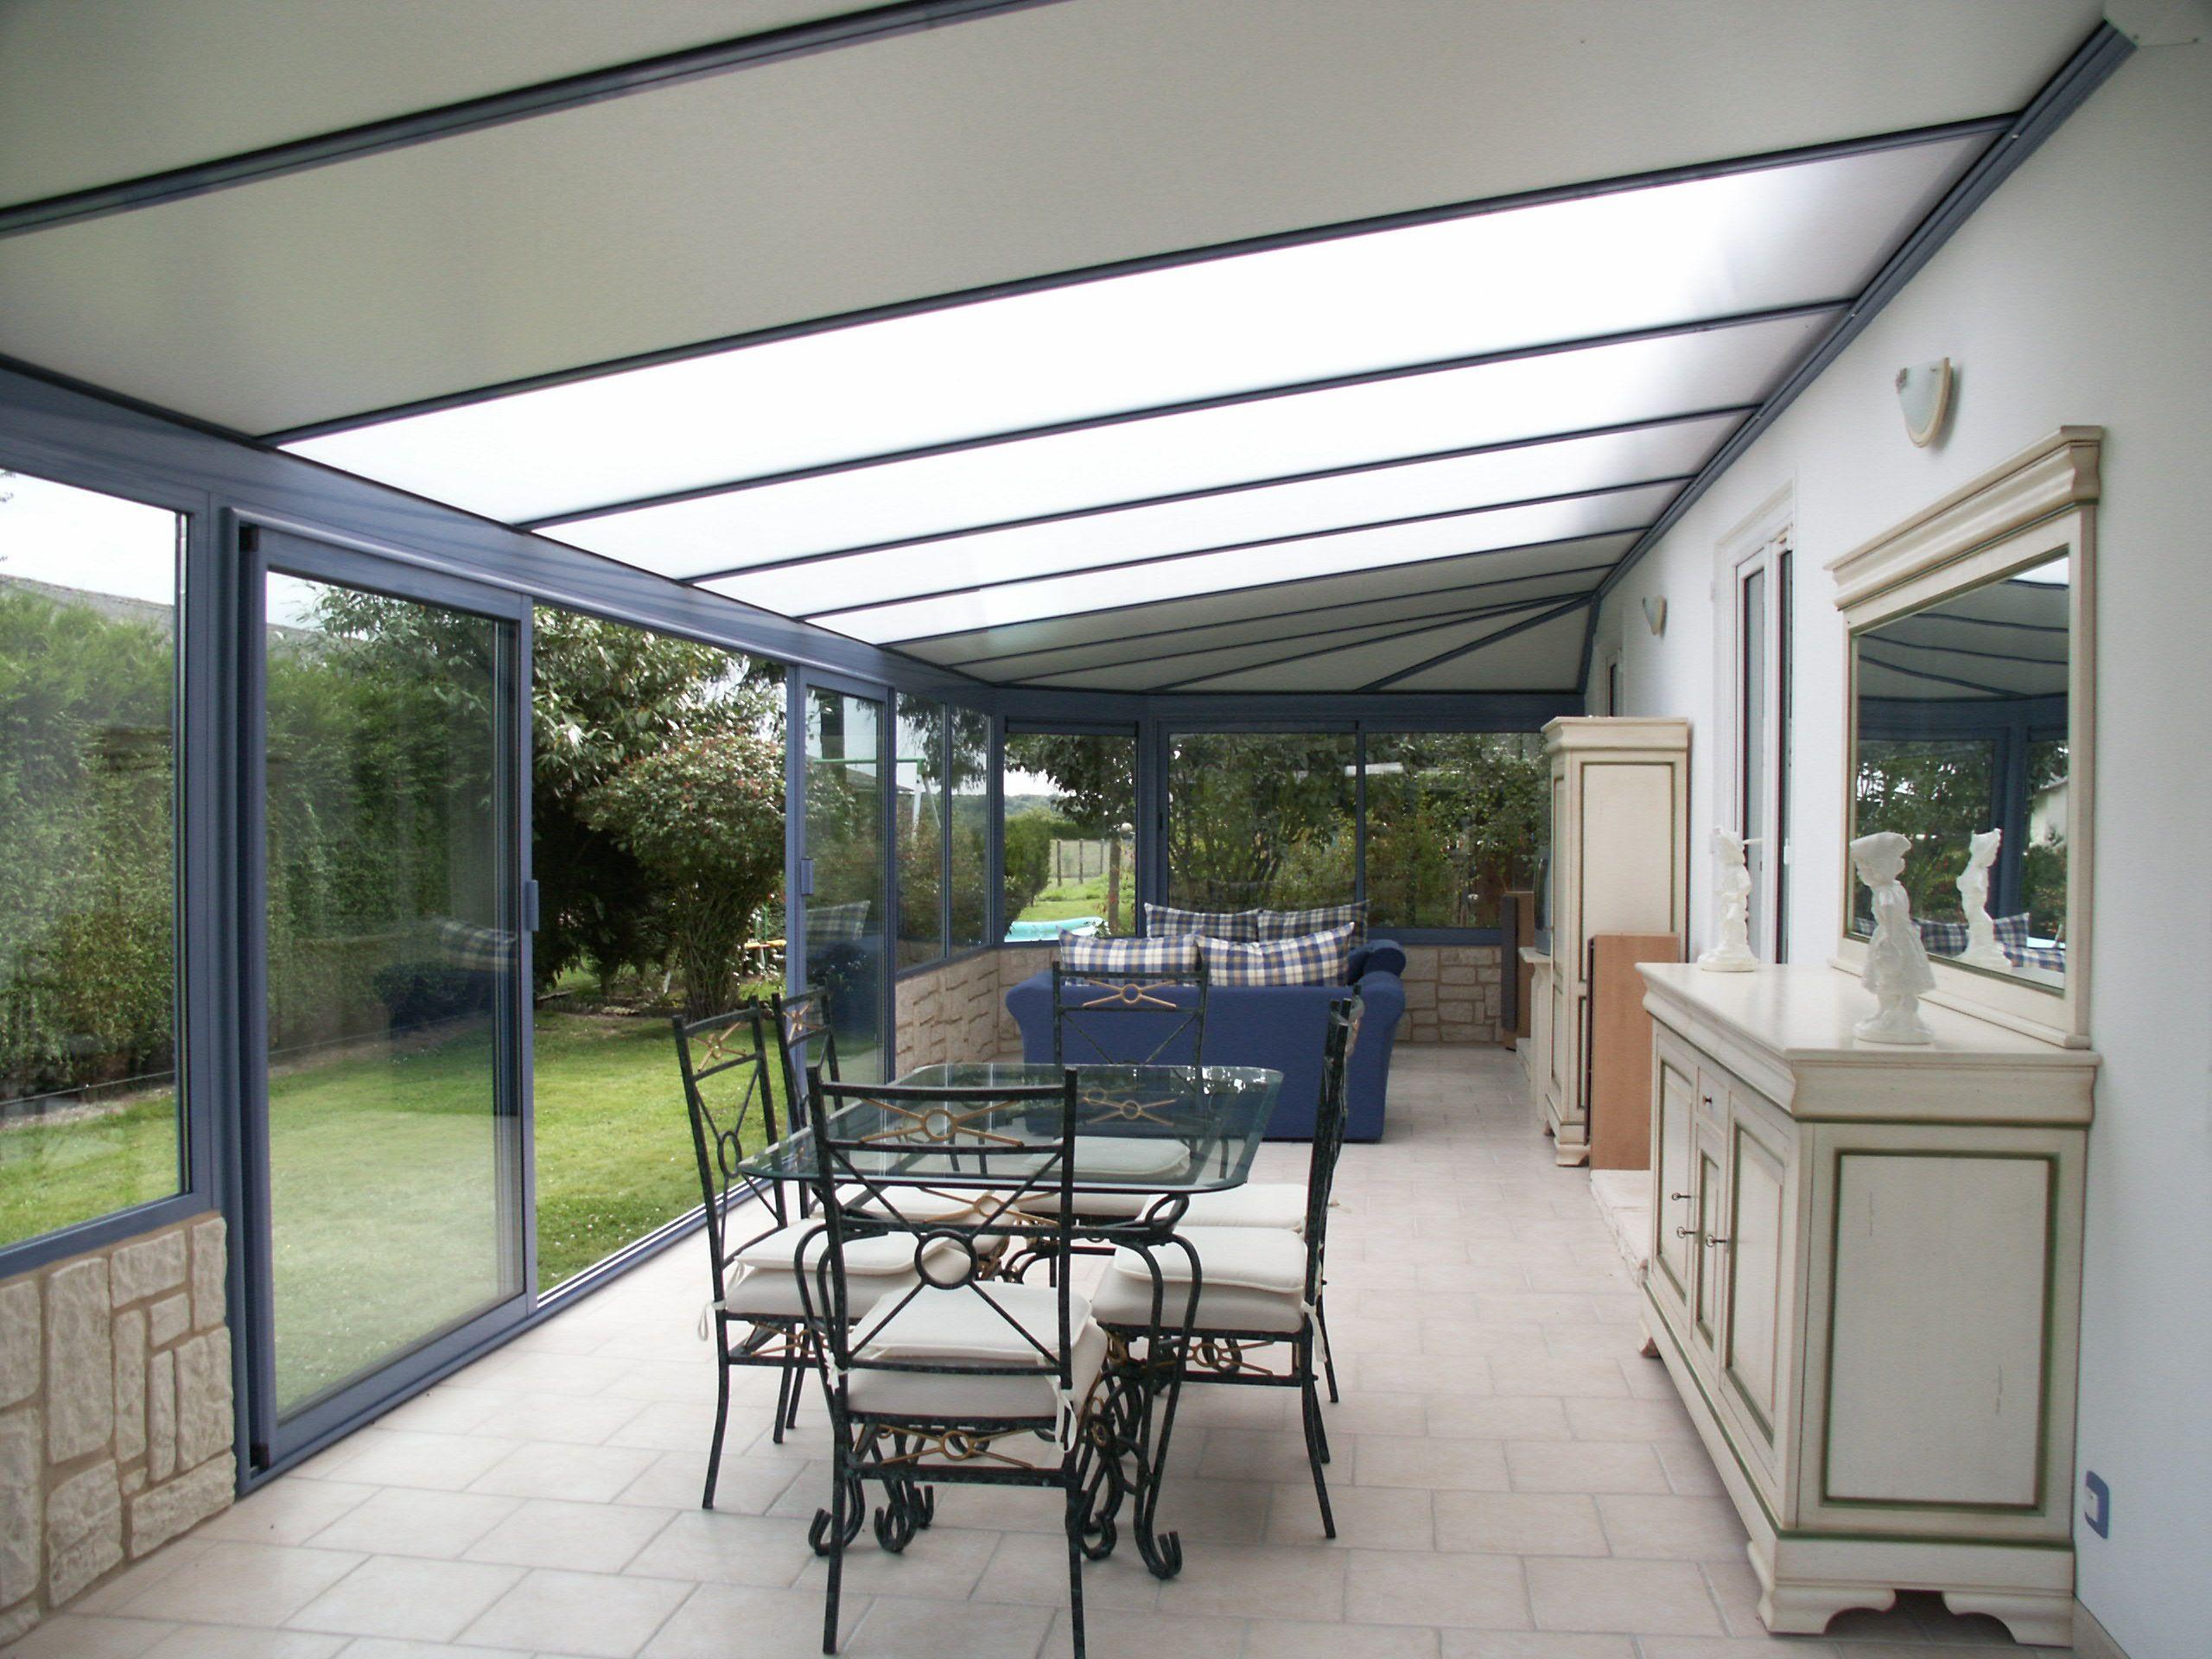 construire sa veranda soimme elegant comment construire une pergola guide pratique et modles. Black Bedroom Furniture Sets. Home Design Ideas